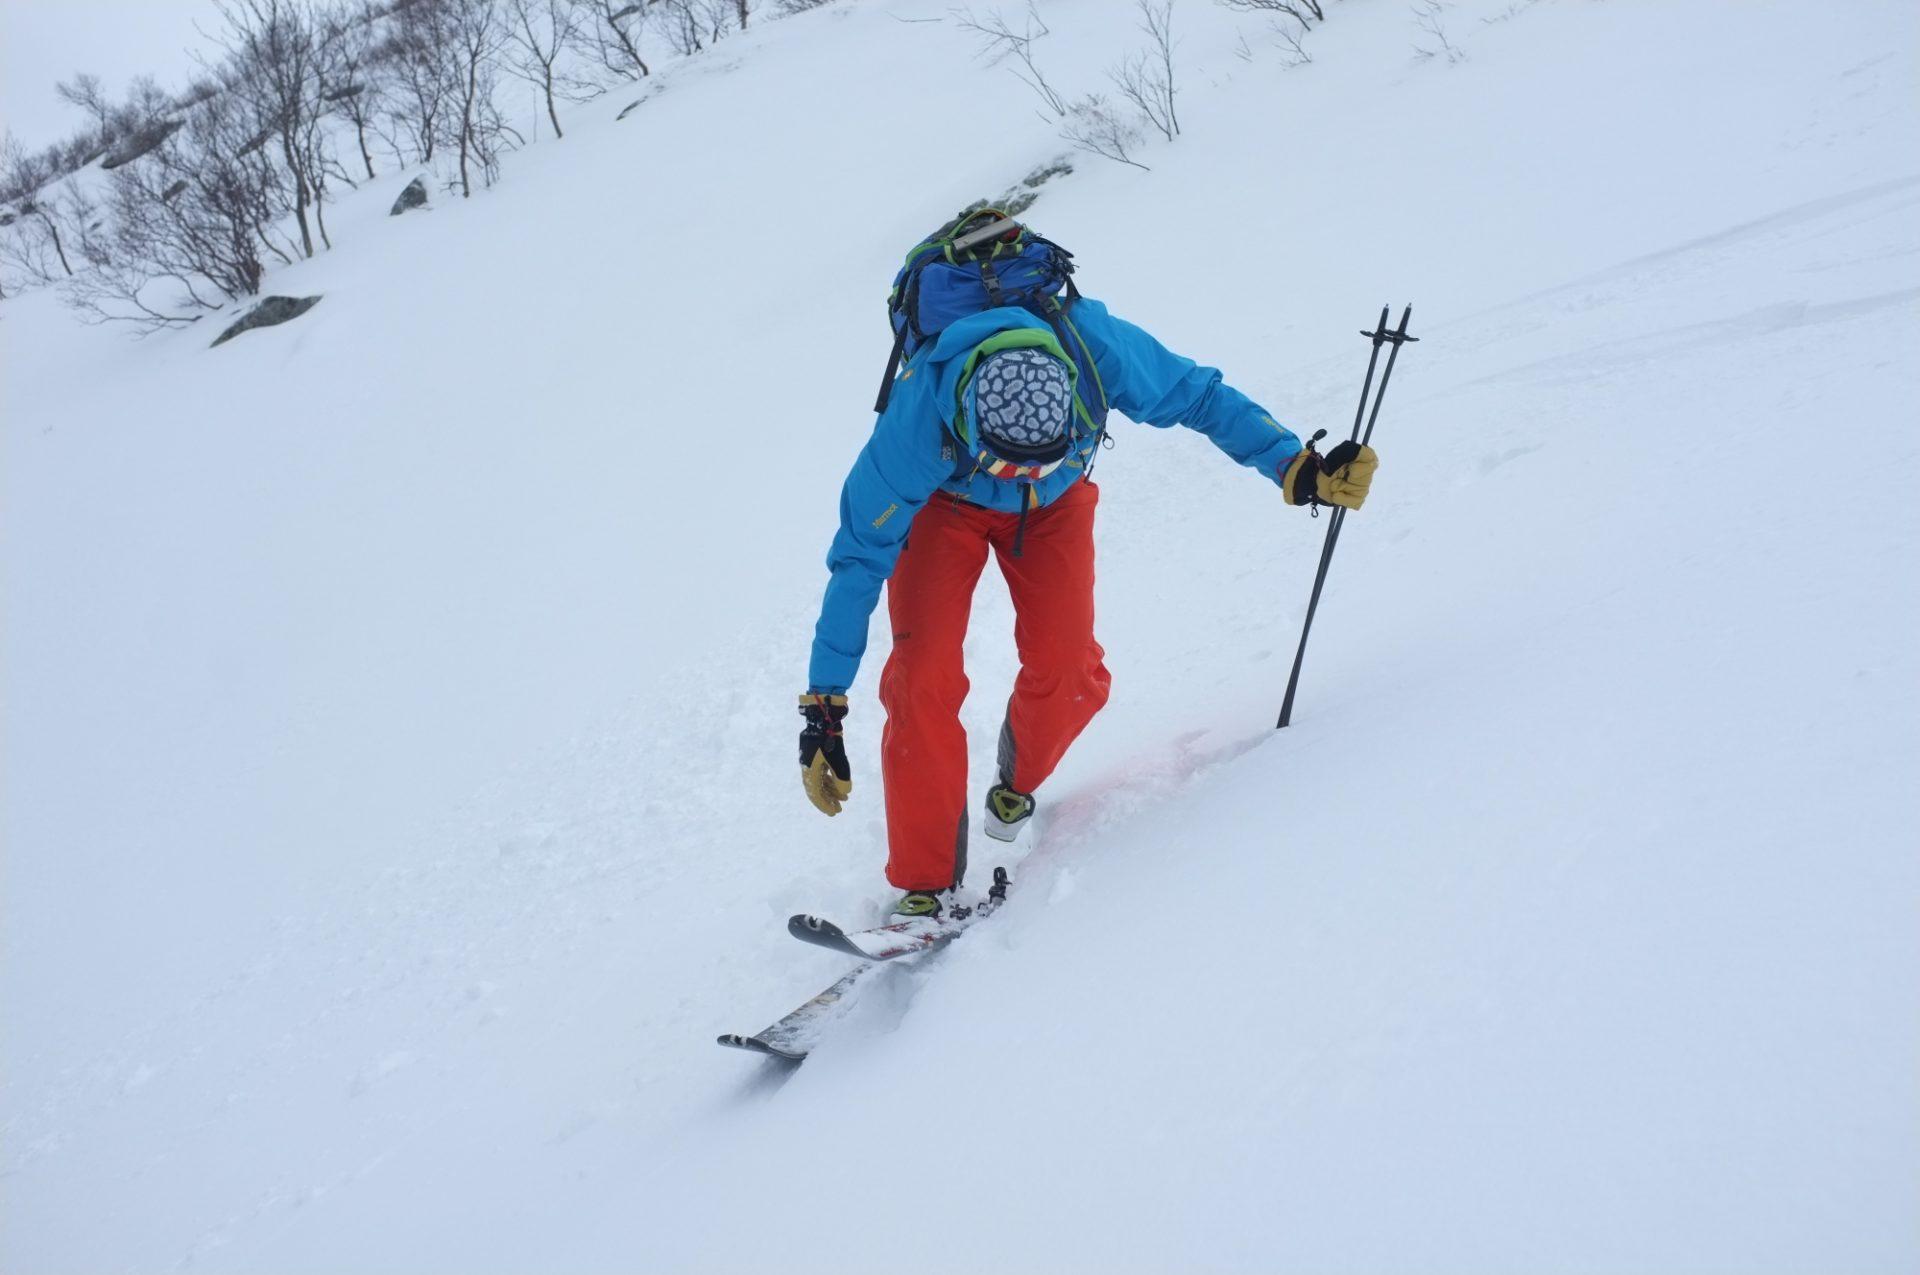 Bergsteigertipp Ski anziehen 4 I (c) Peter Plattner